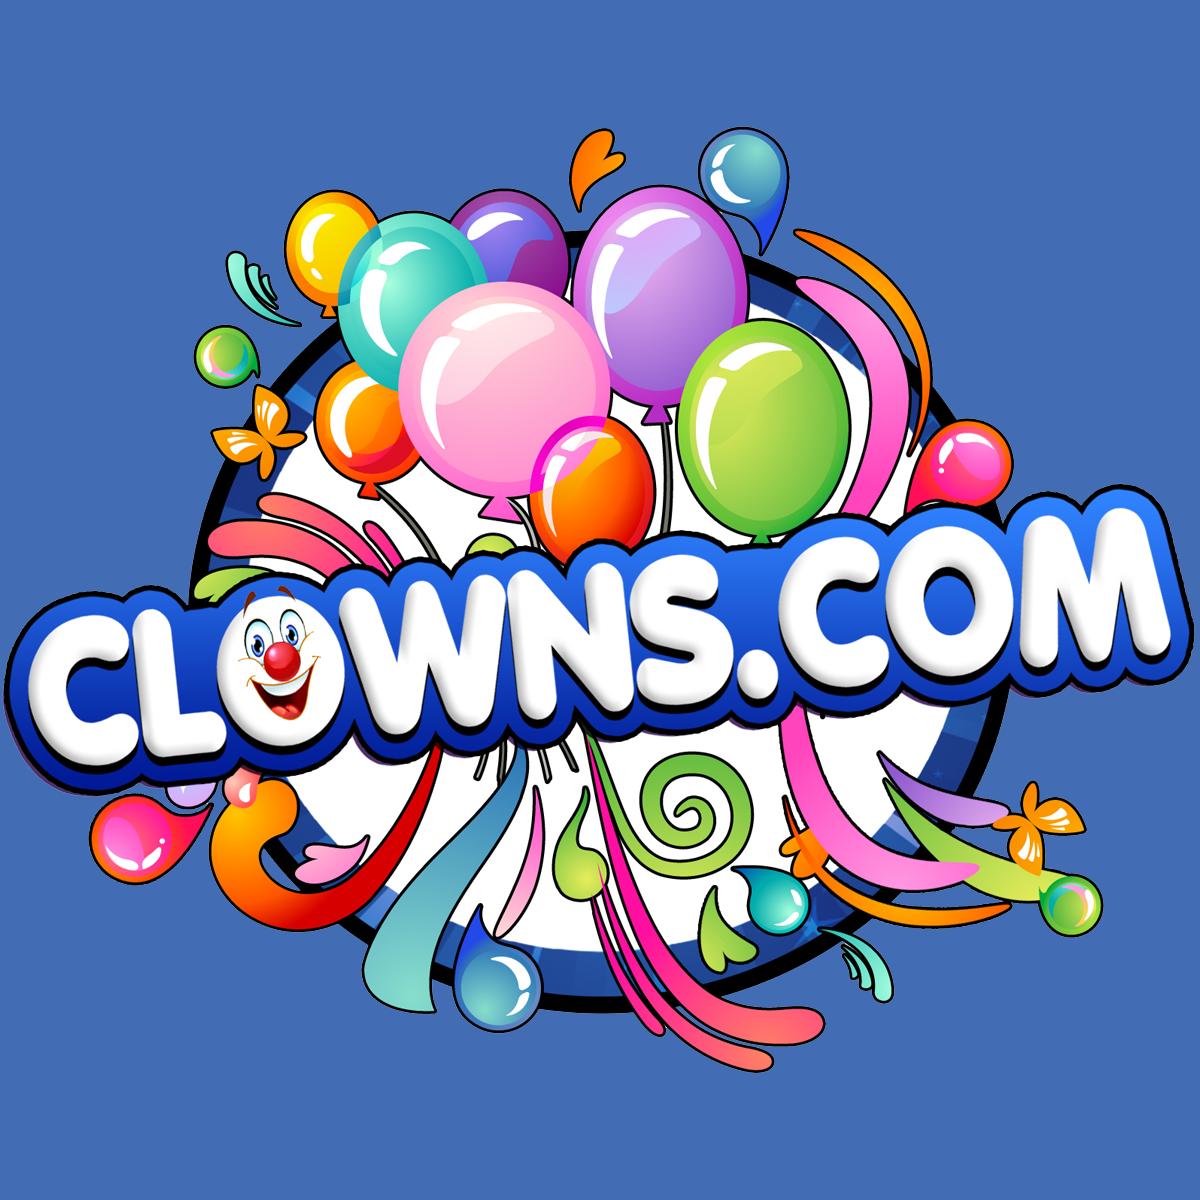 Entertainer in NY Elmont 11003 Clowns 200 Meacham Ave  (516)577-0000